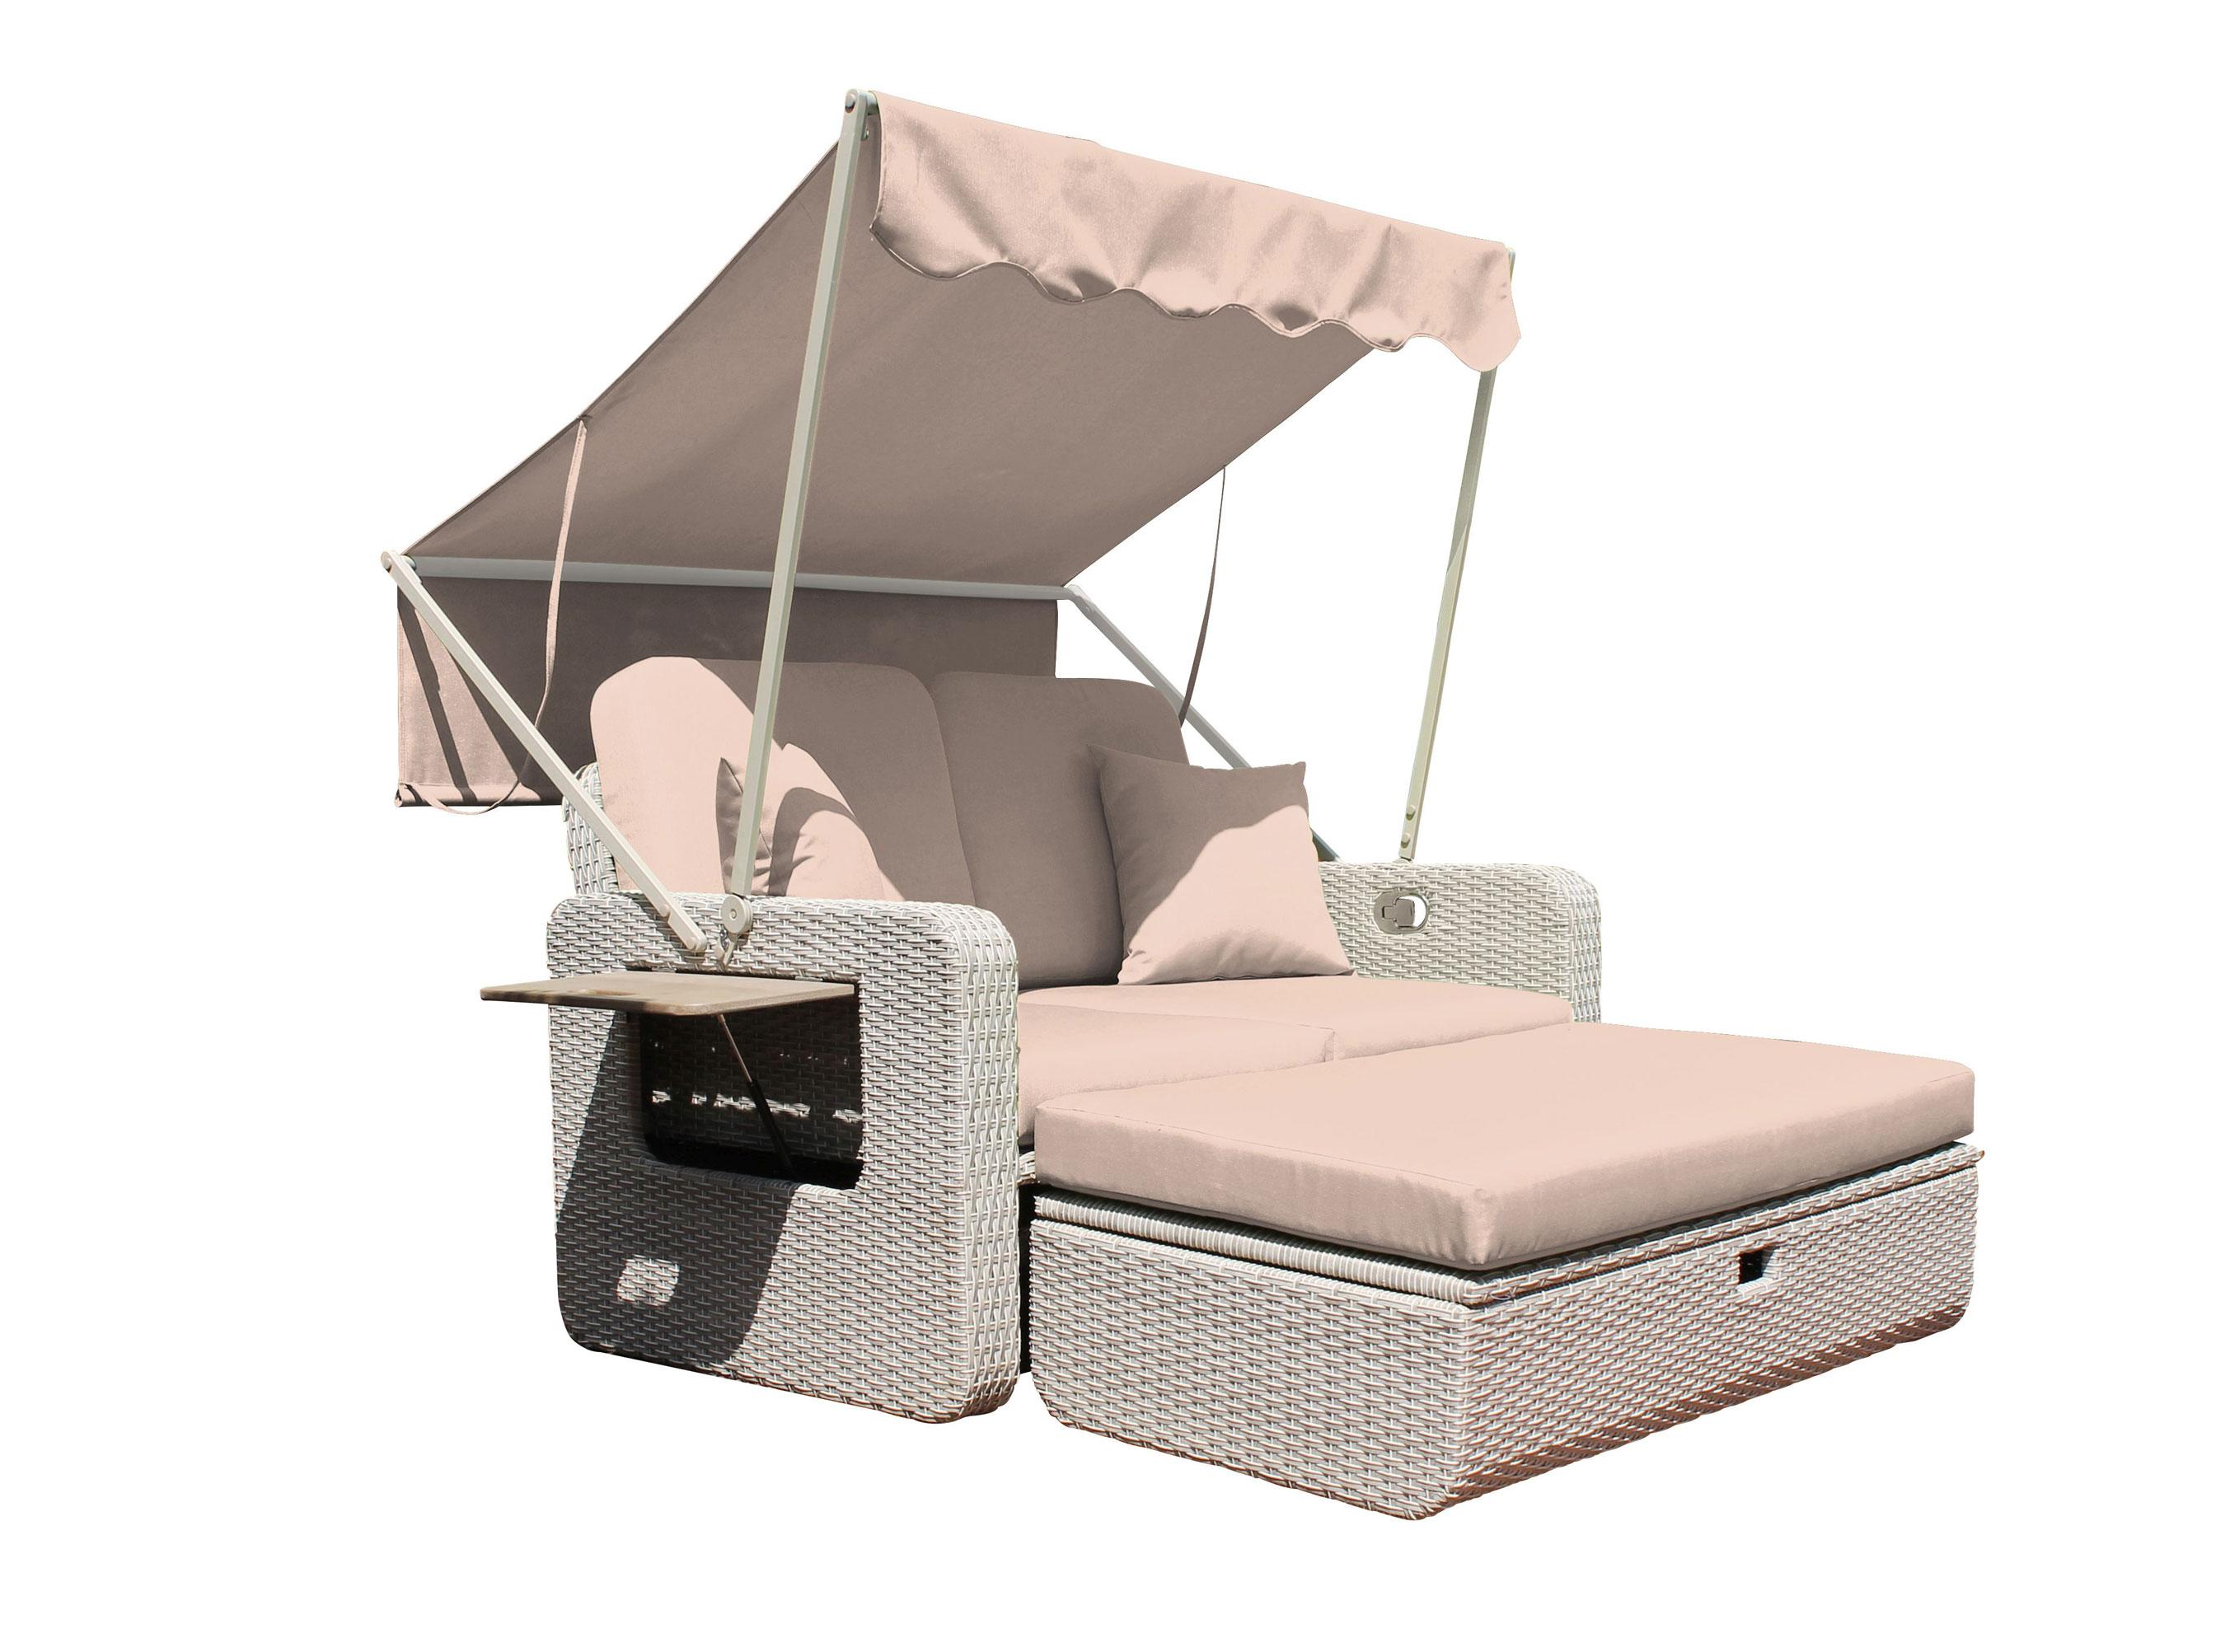 gartenbank 2 sitzer sofa leco wohlf hl rattan 2 sitzer dach taupe bei. Black Bedroom Furniture Sets. Home Design Ideas